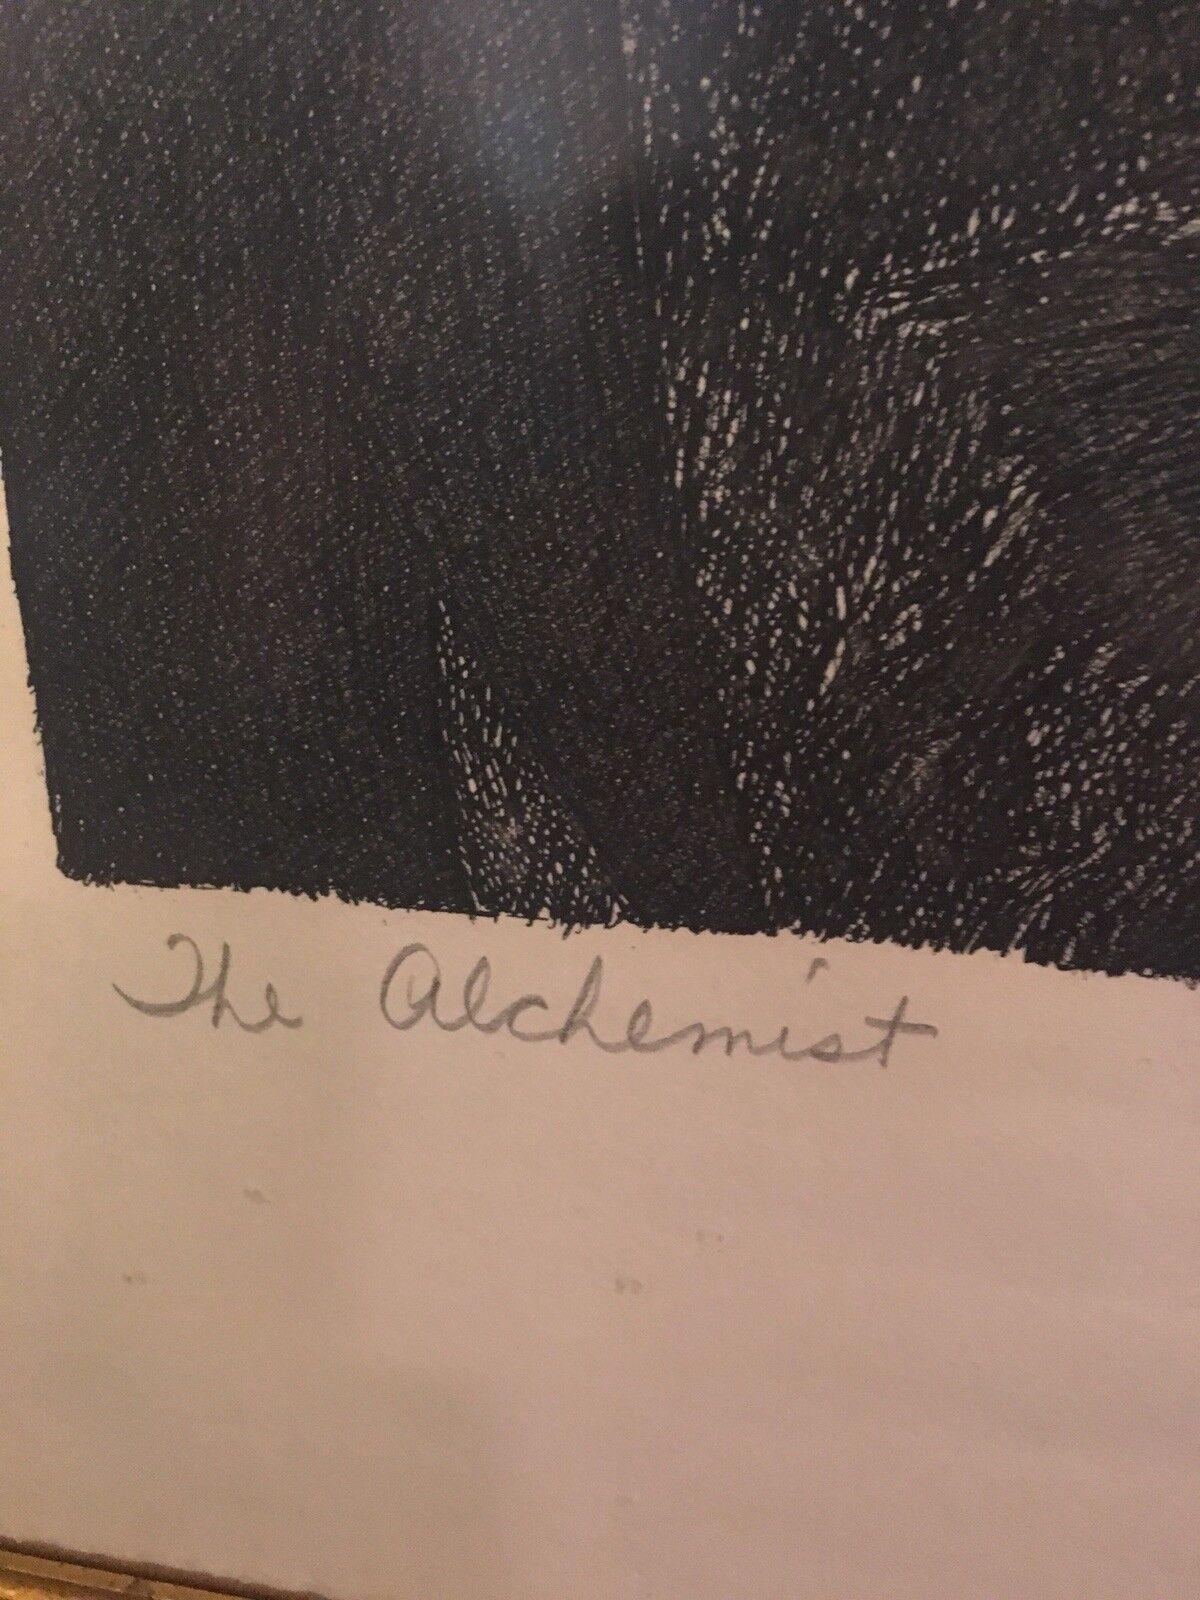 Federico Castellon The Alchemist Signed Print Rare 1960 s - $499.99